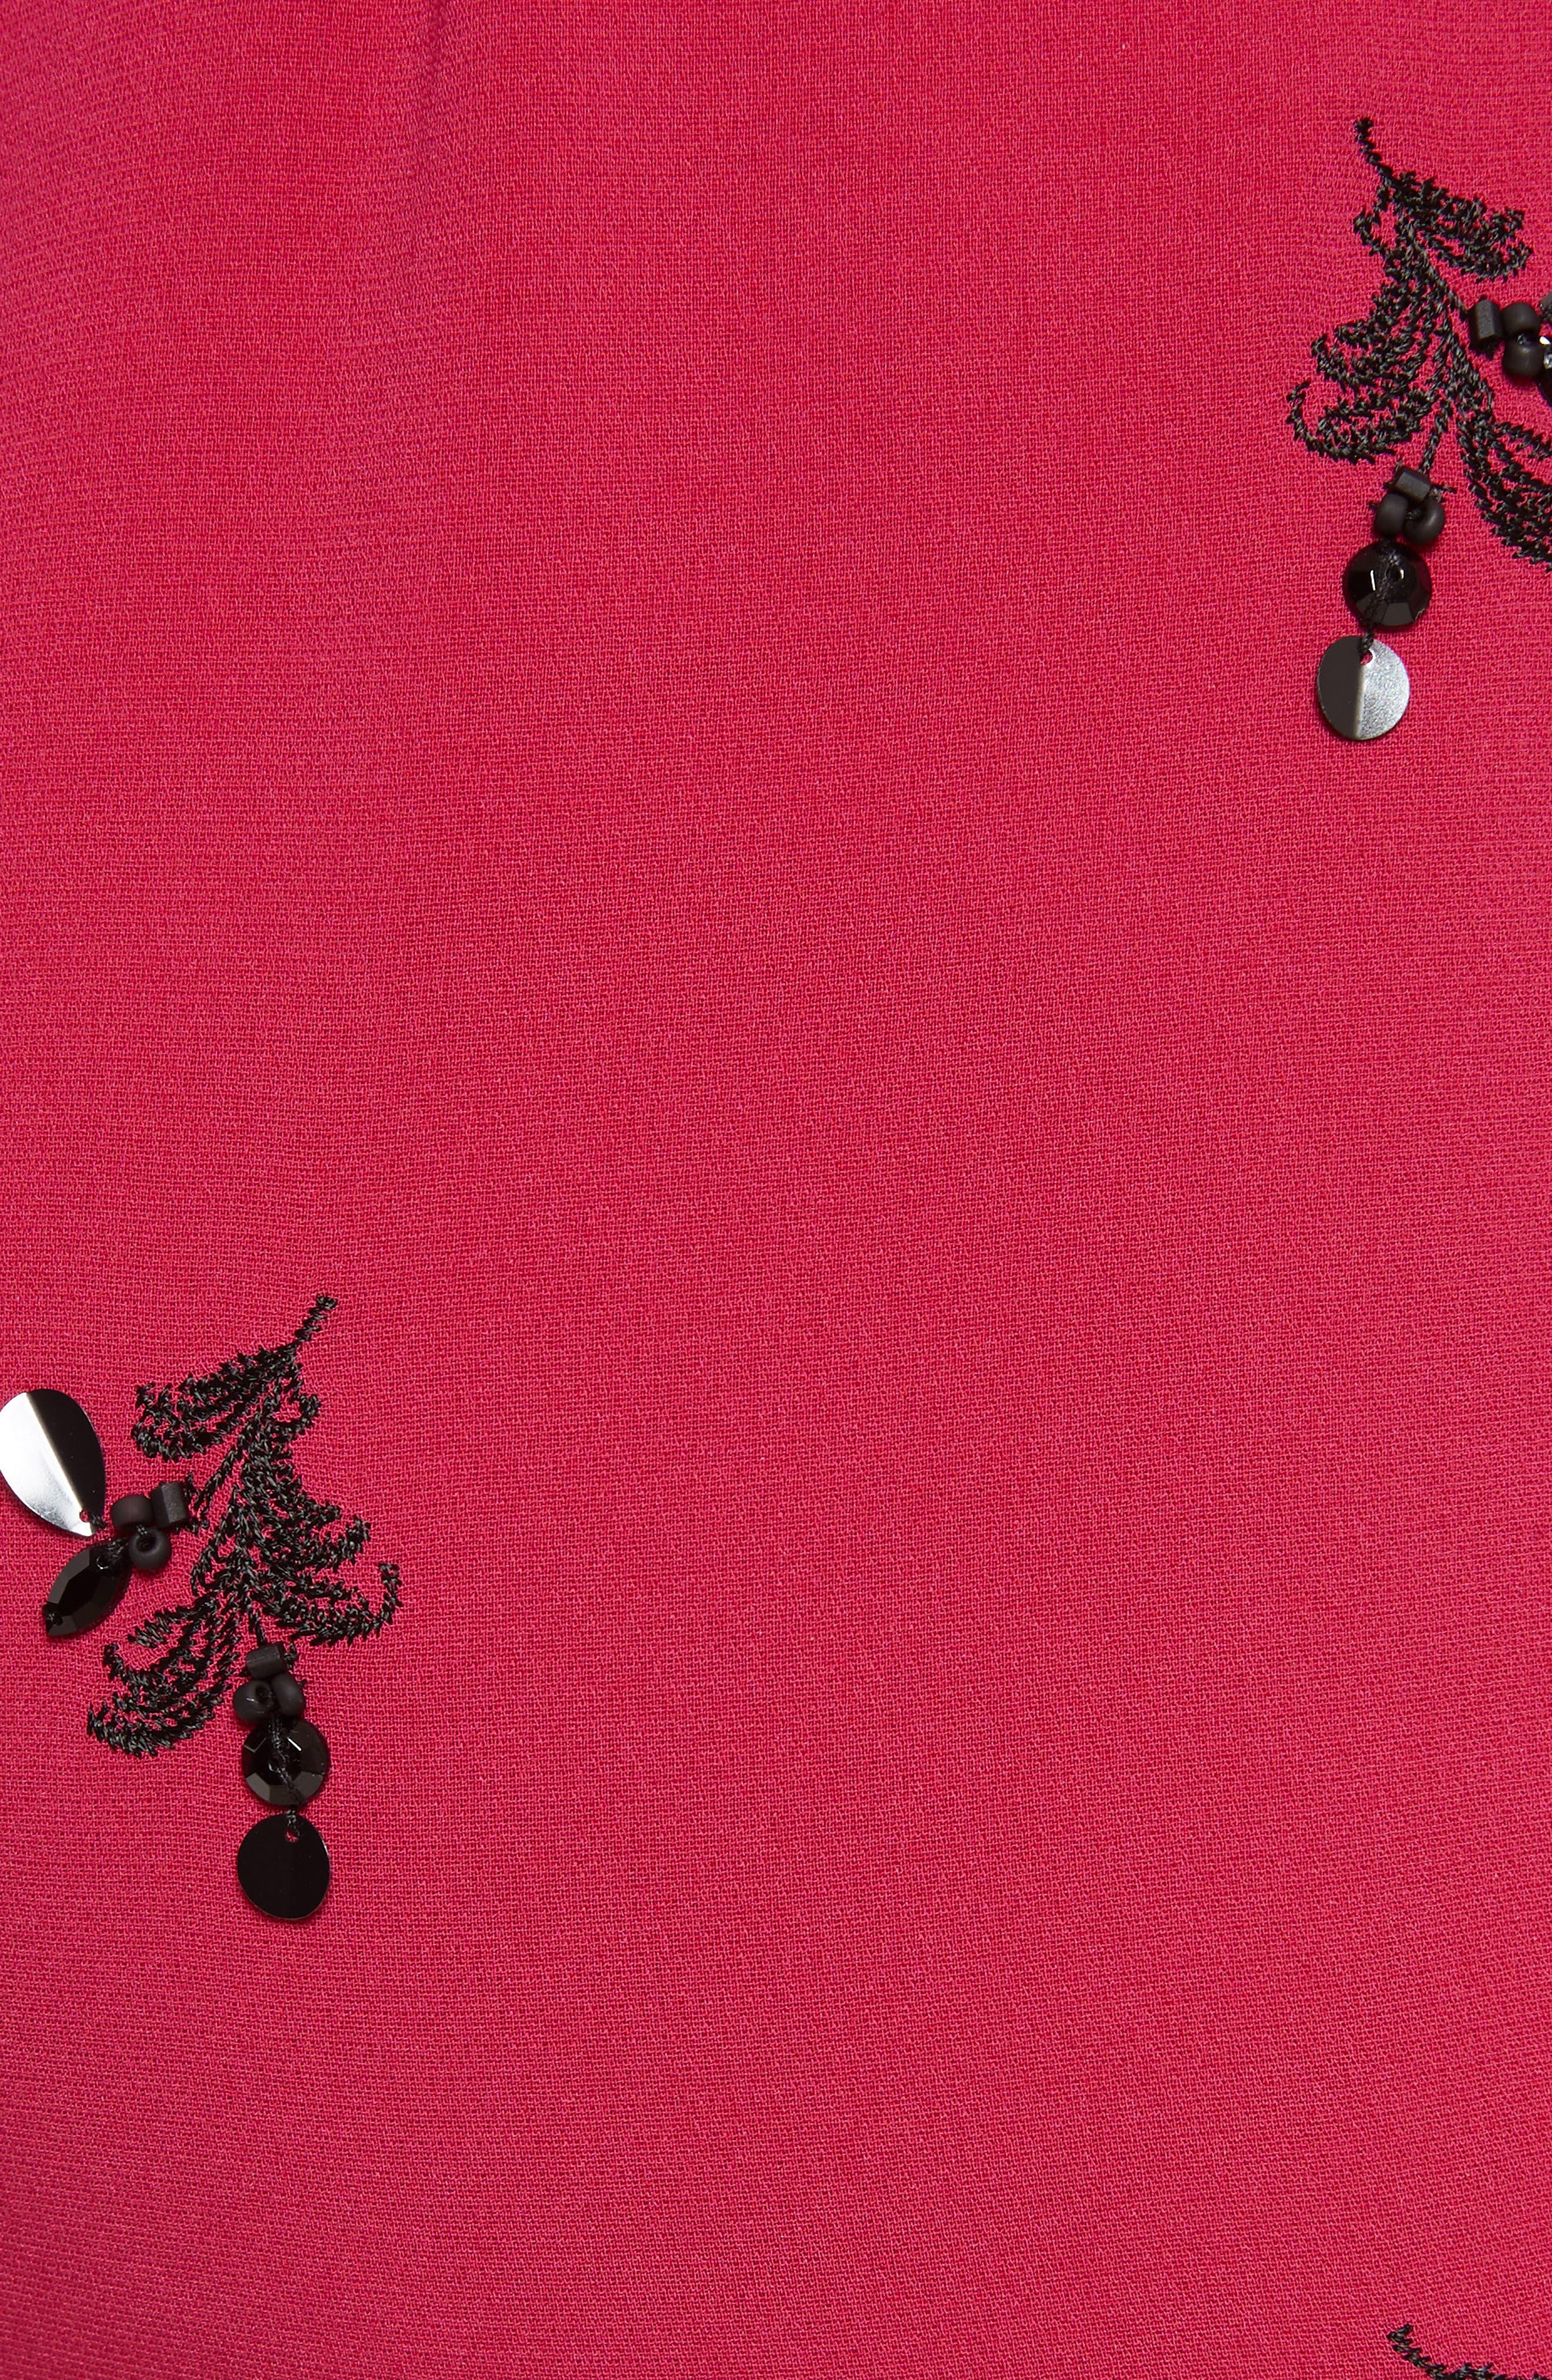 Gal Embroidered Lace-Up Back Dress,                             Alternate thumbnail 5, color,                             Cerise/ Black